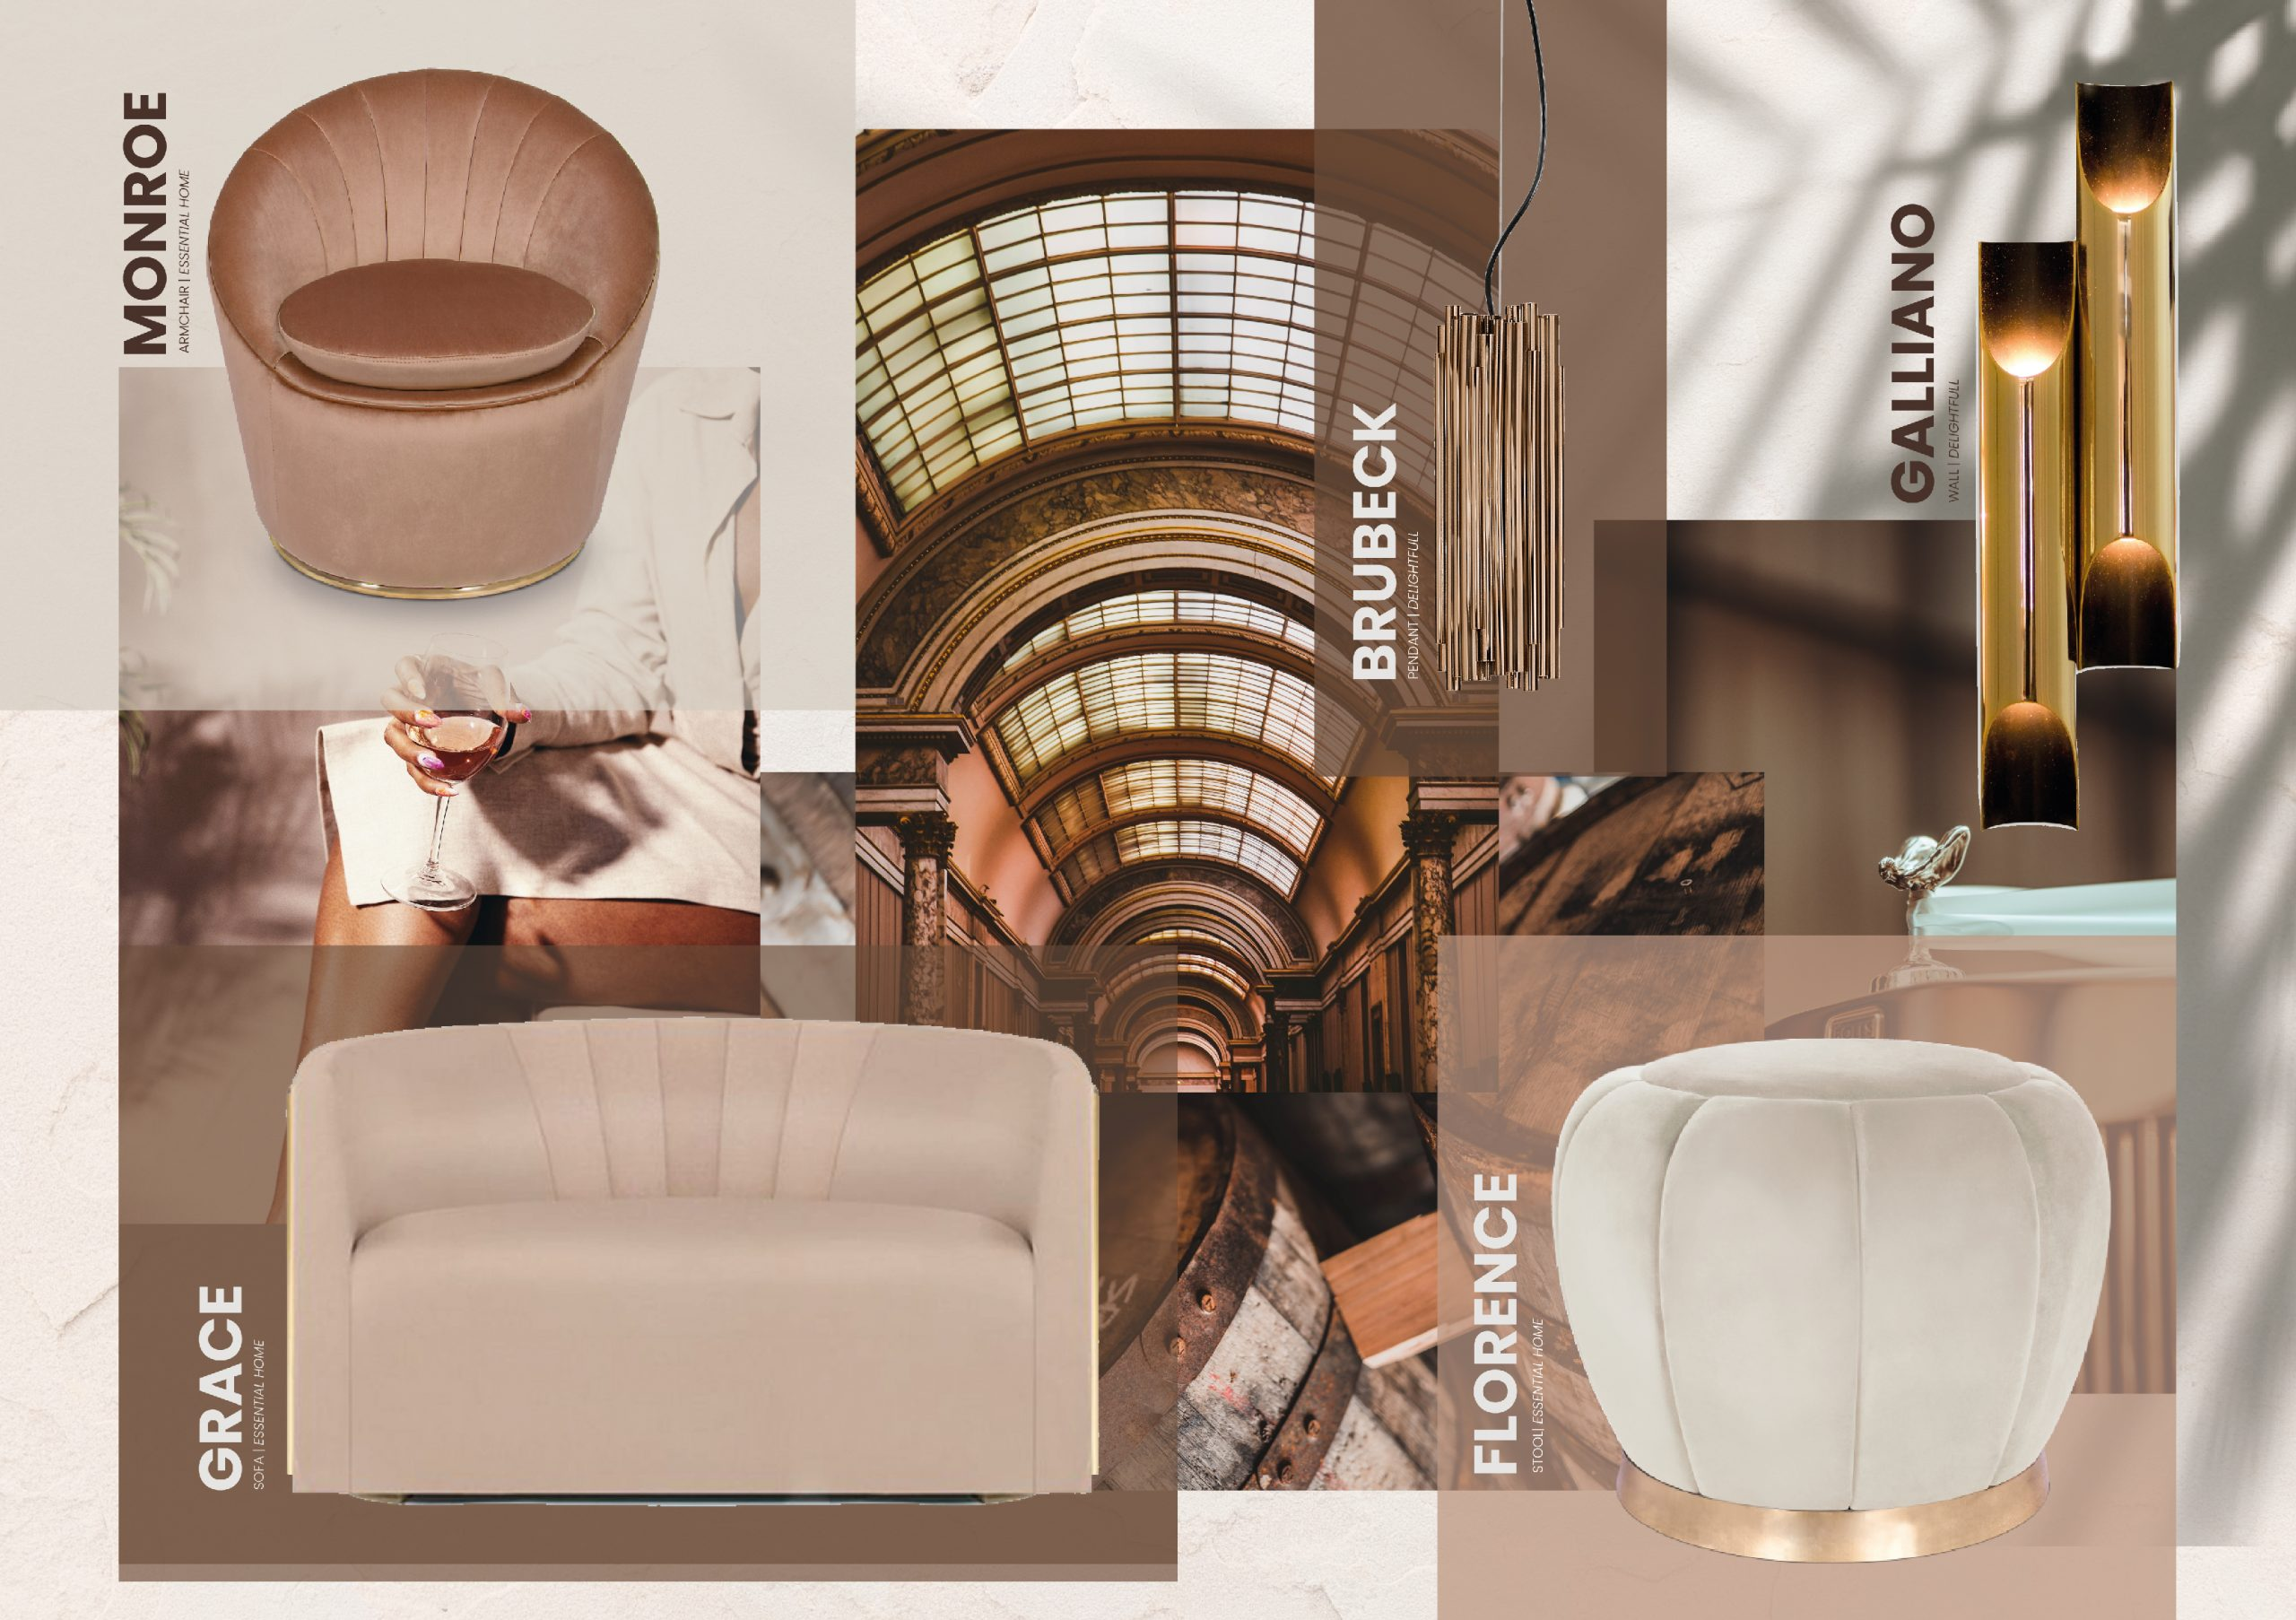 Our Top 5 Luxurious Decor Ideas